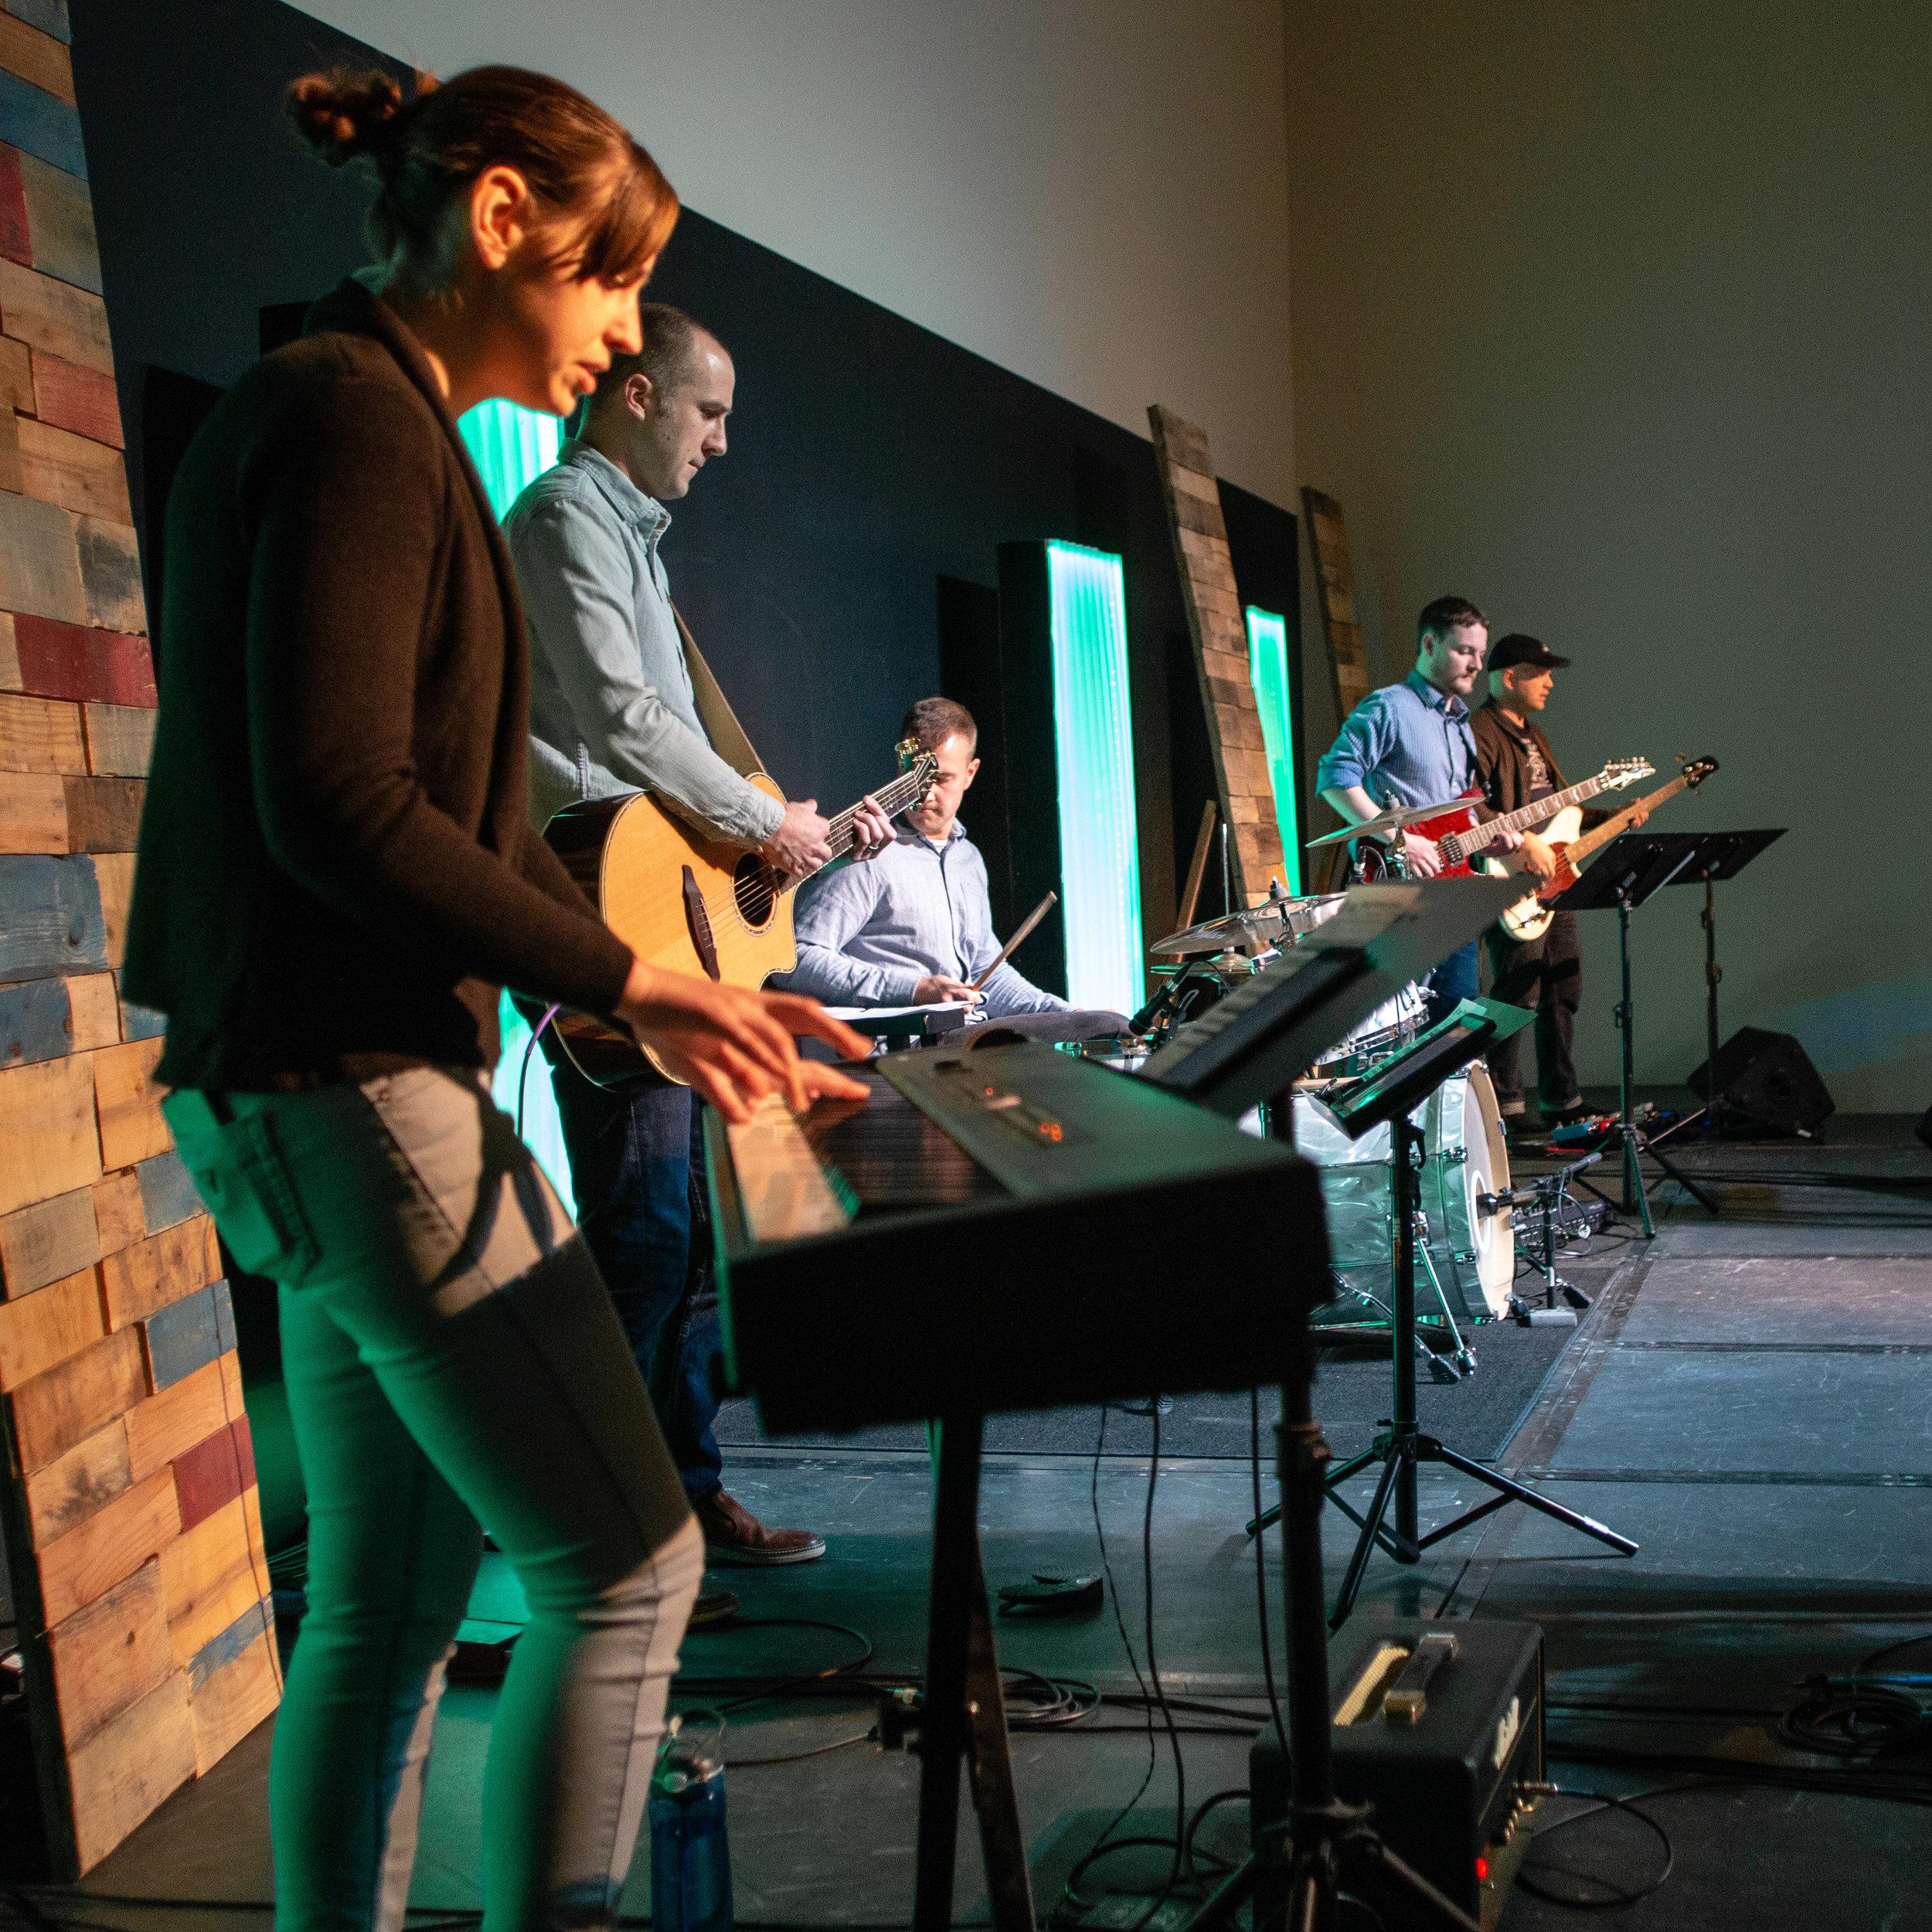 The Band: Pianist & Keyboardist - Volunteer